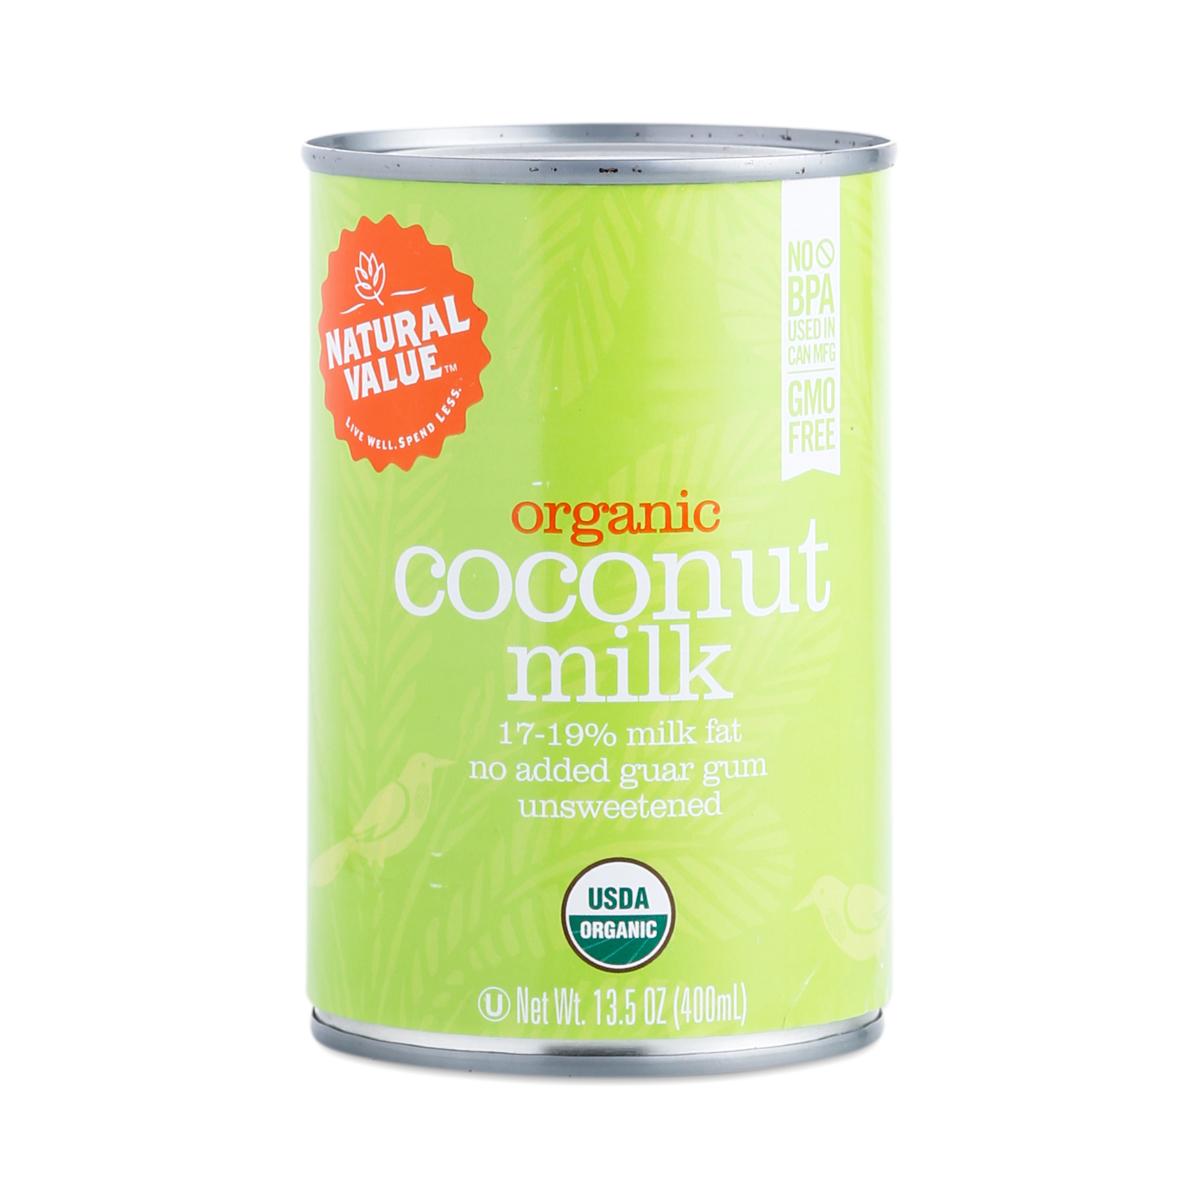 Pure organic milk